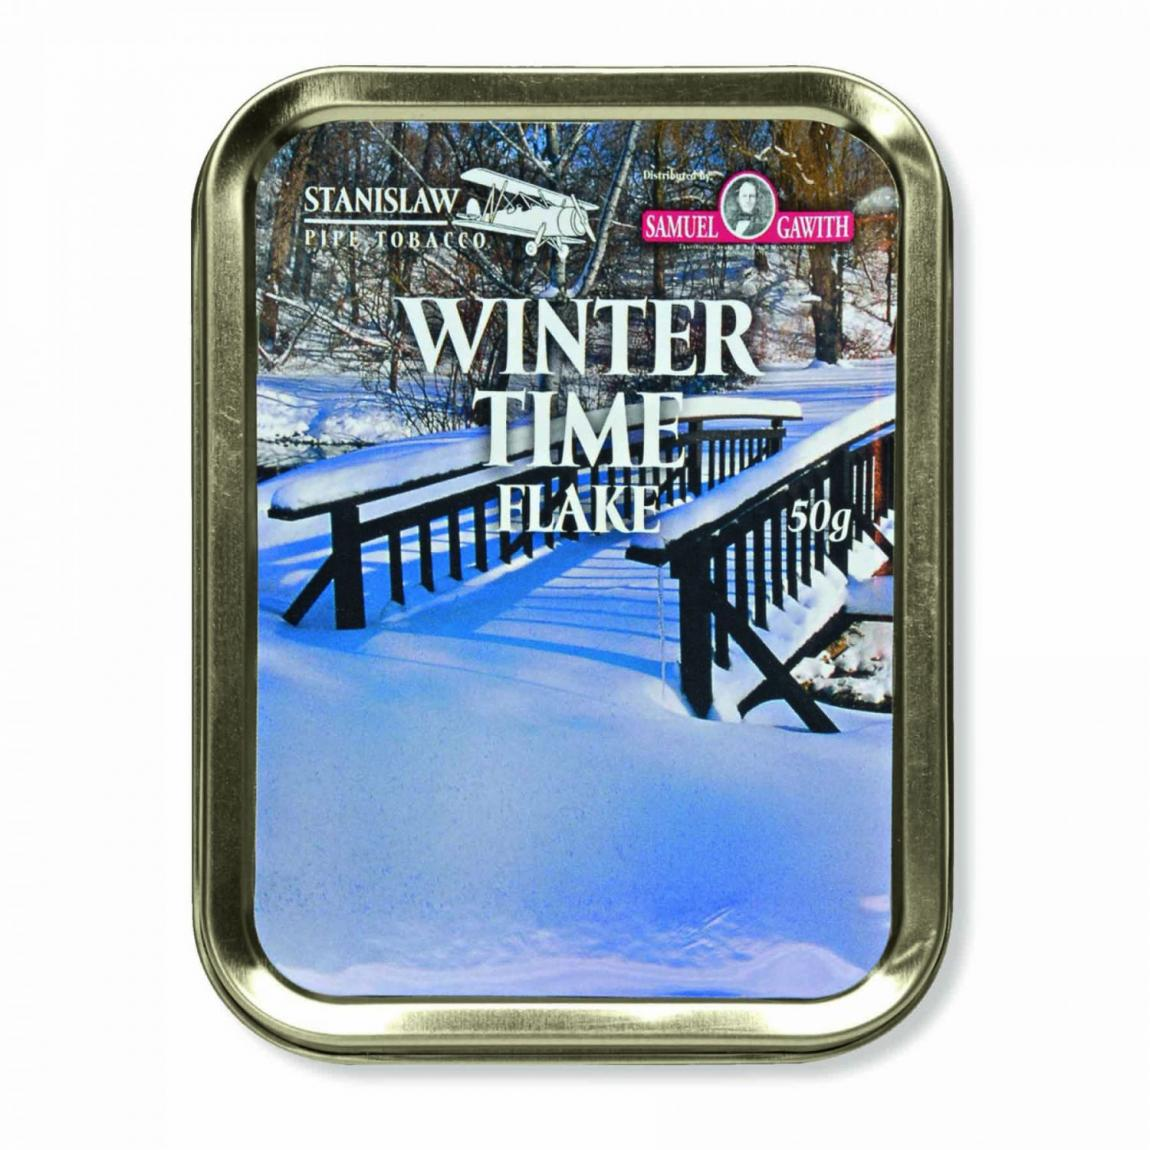 Samuel Gawith »Wintertime Flake« 50g Dose